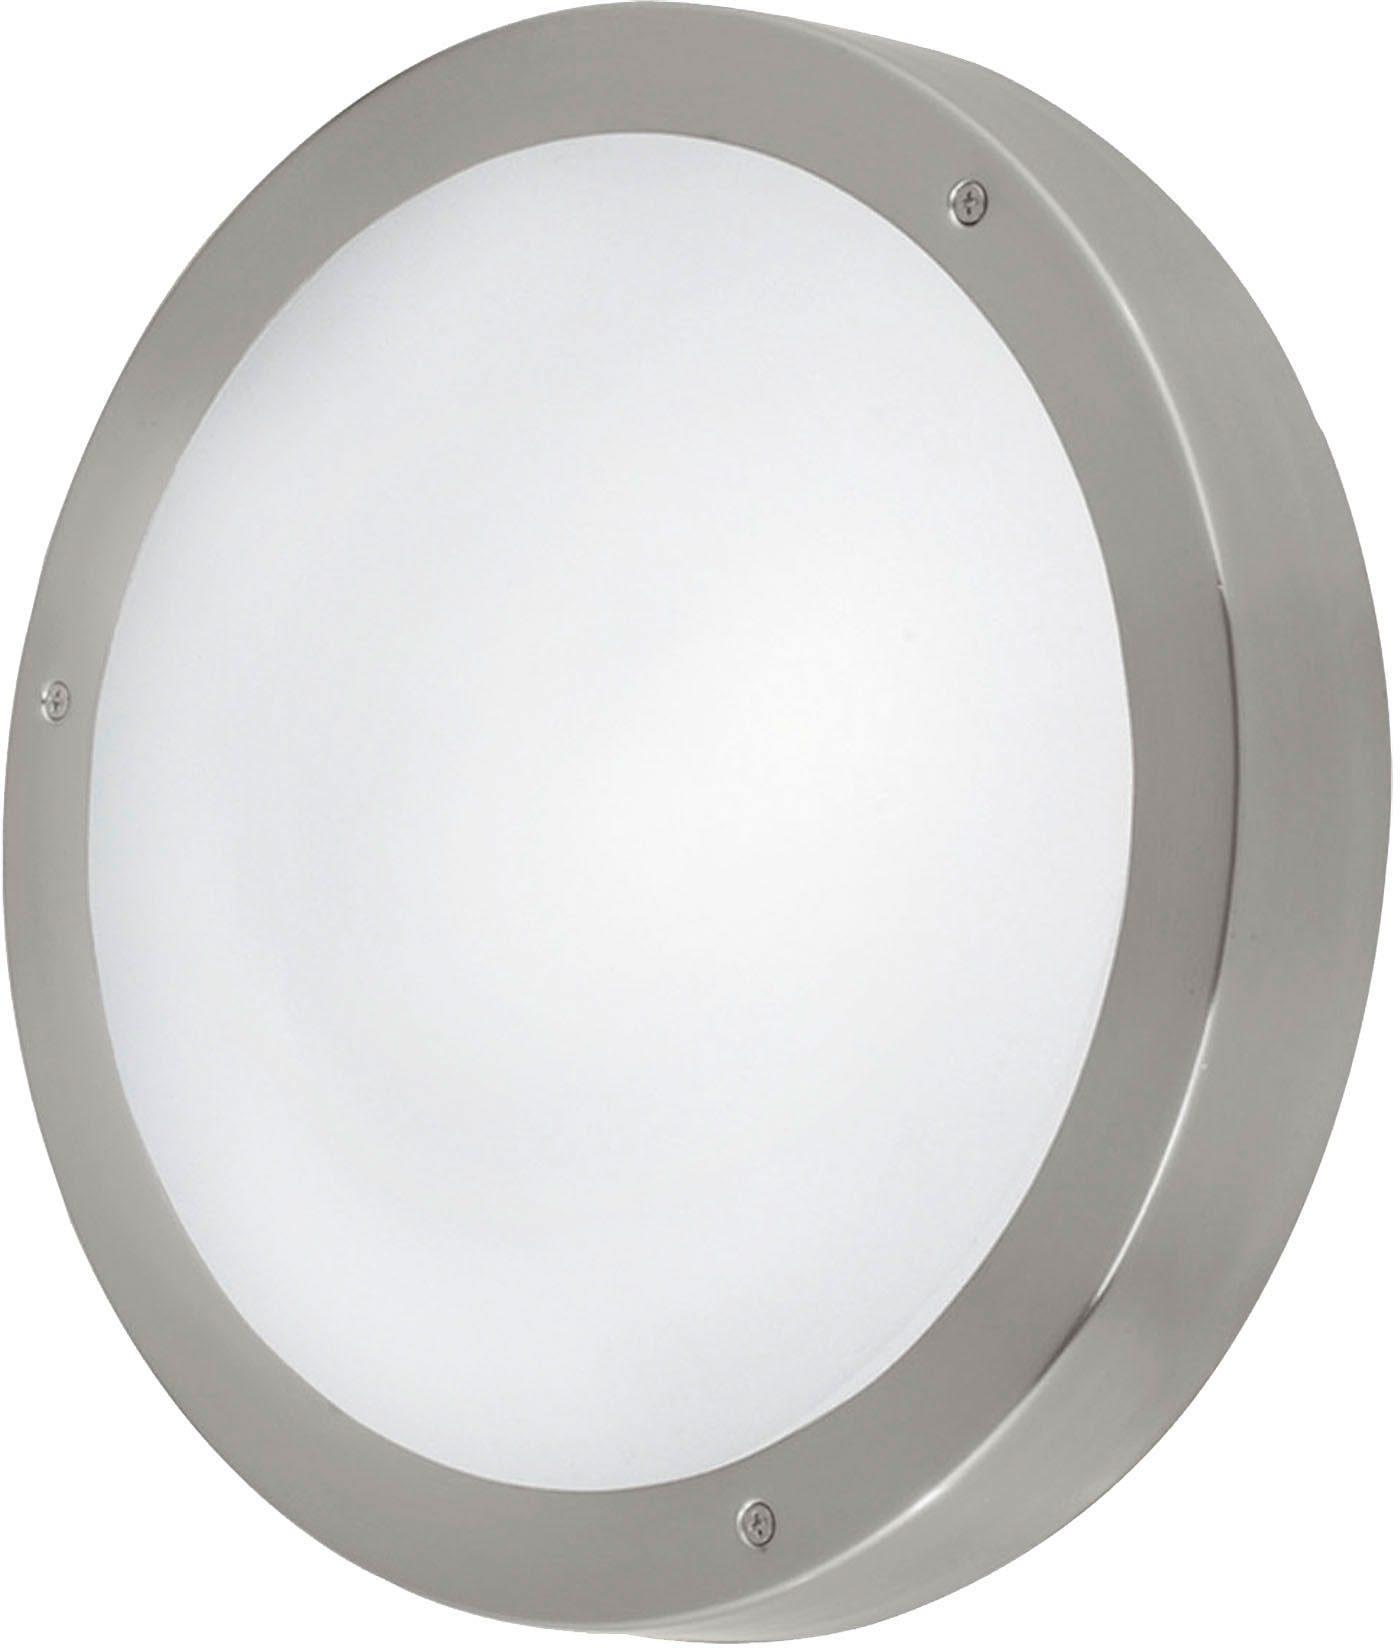 Eglo LED Außenleuchte, 3 flg., Wandleuchte, »Vento1«